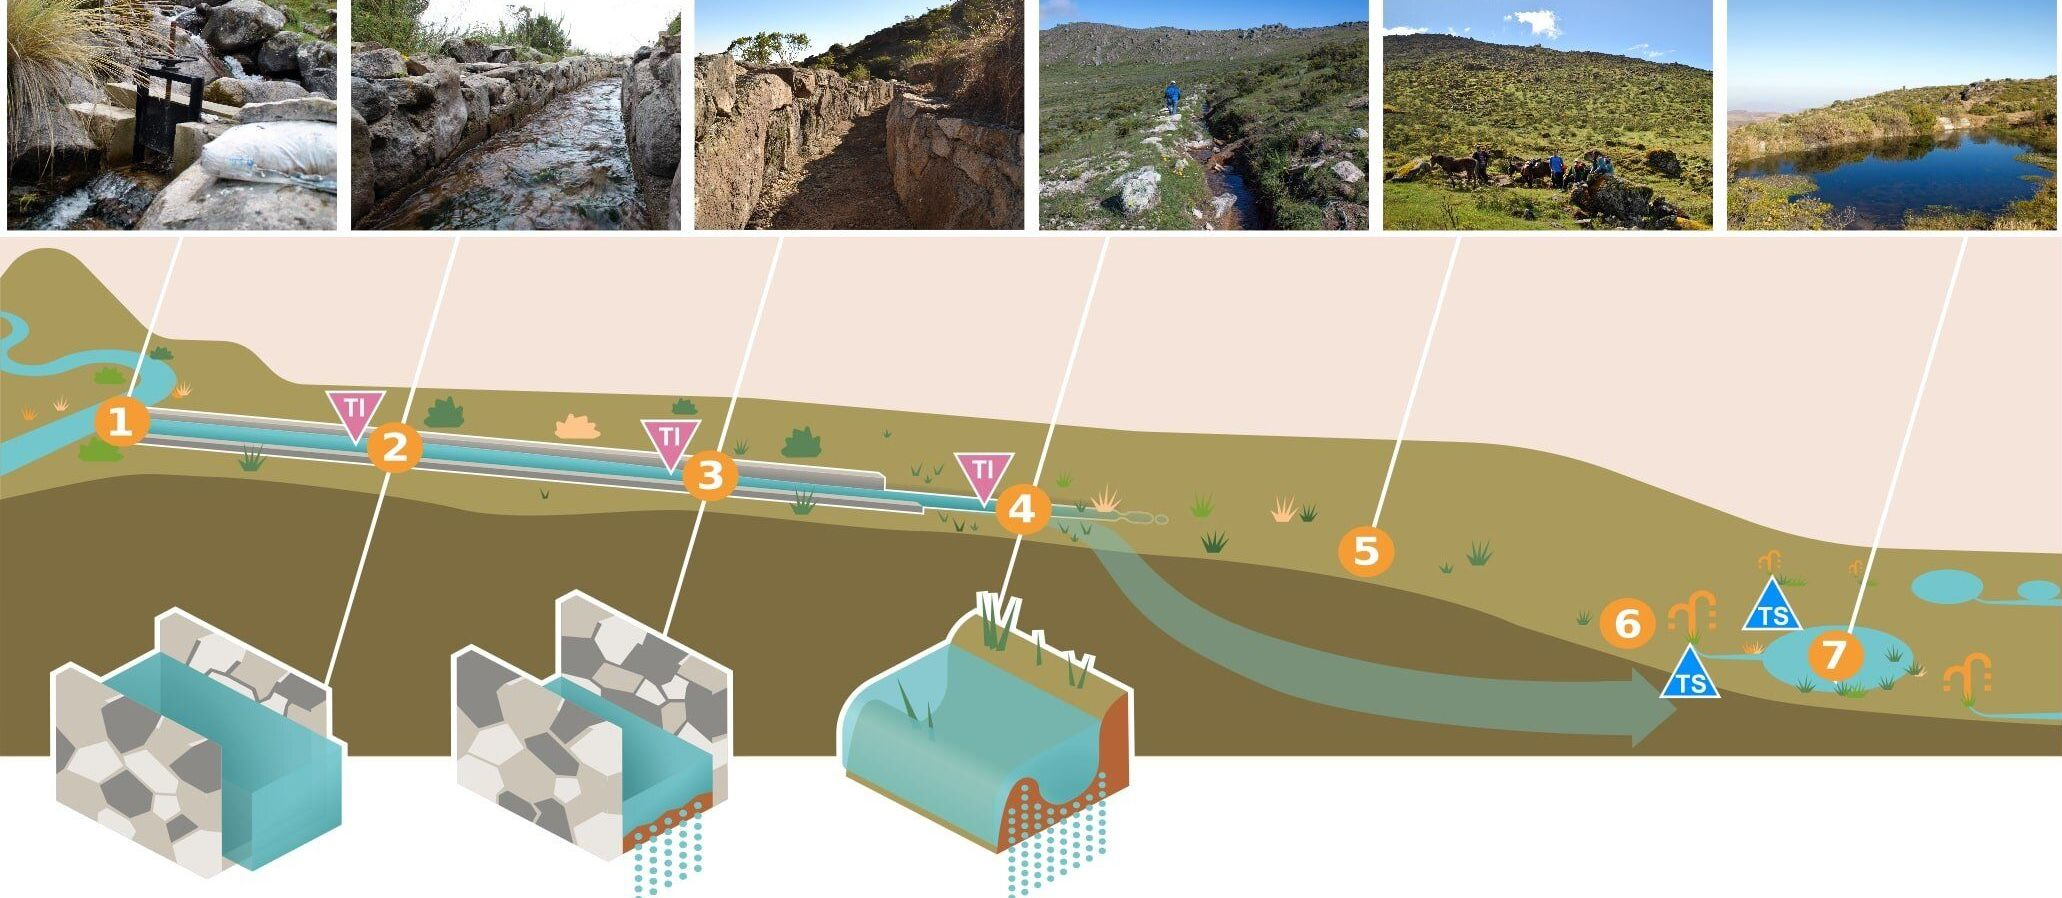 Sistemas de abastecimento de água indígenas